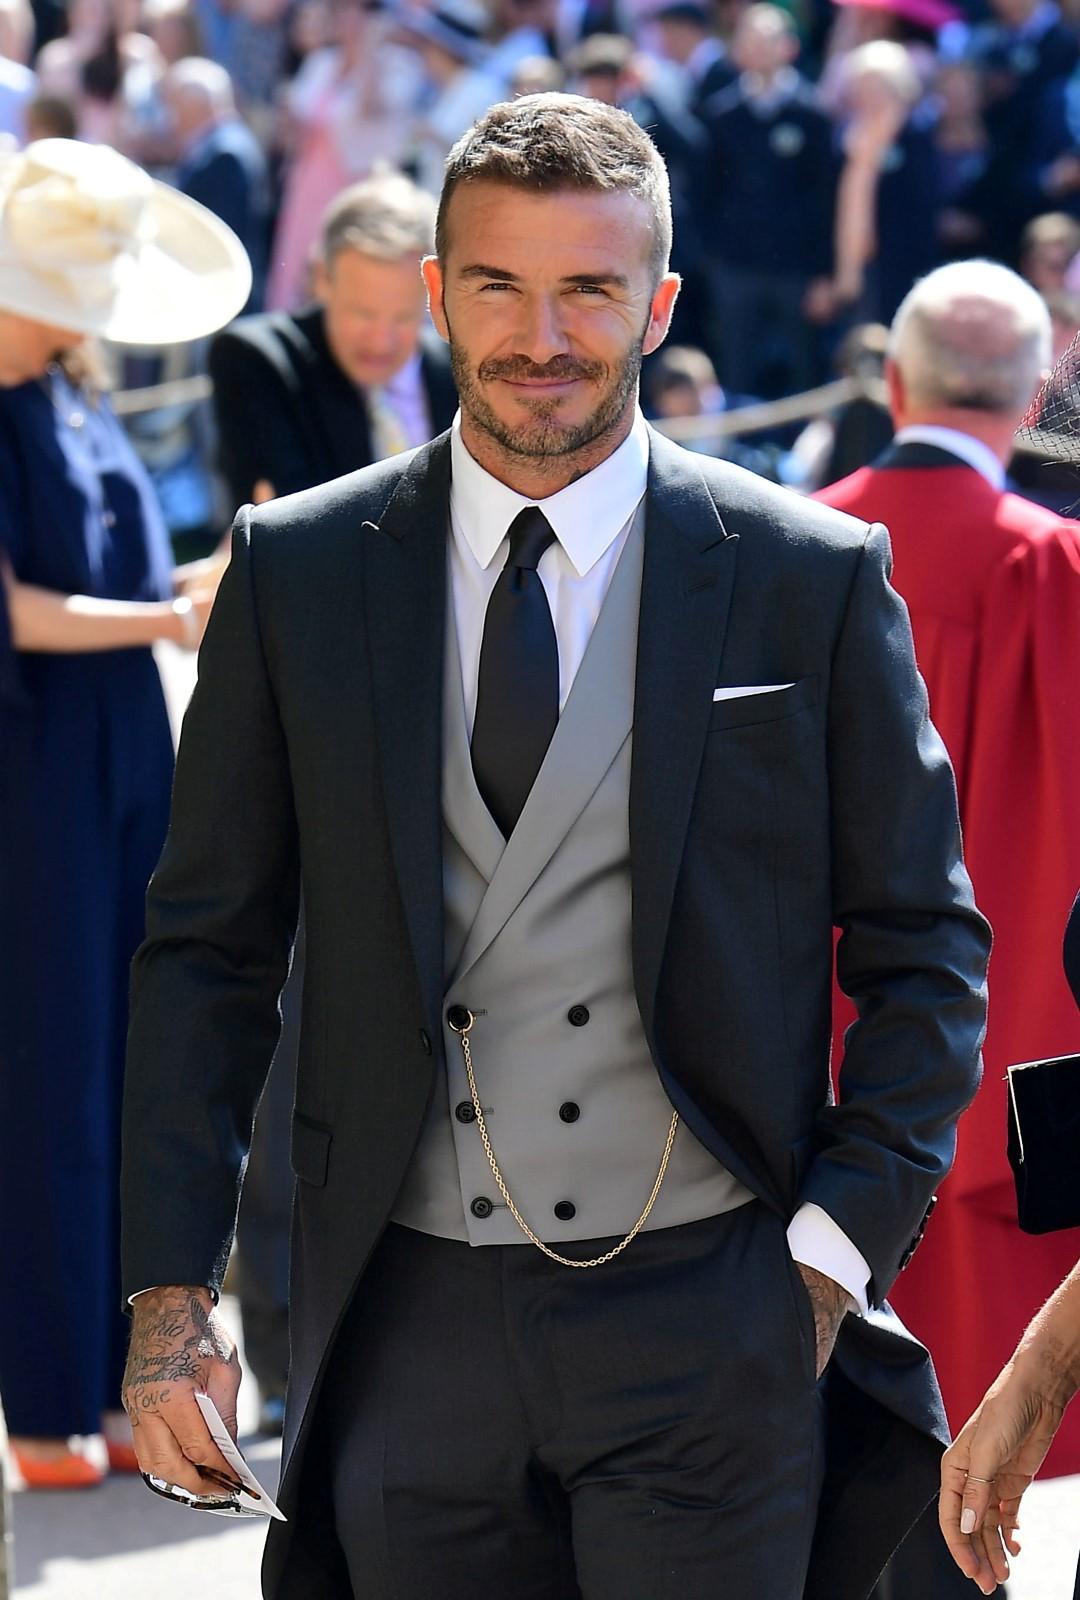 Fotbalista David Beckham na svatbě prince Harryho s Meghan Markle